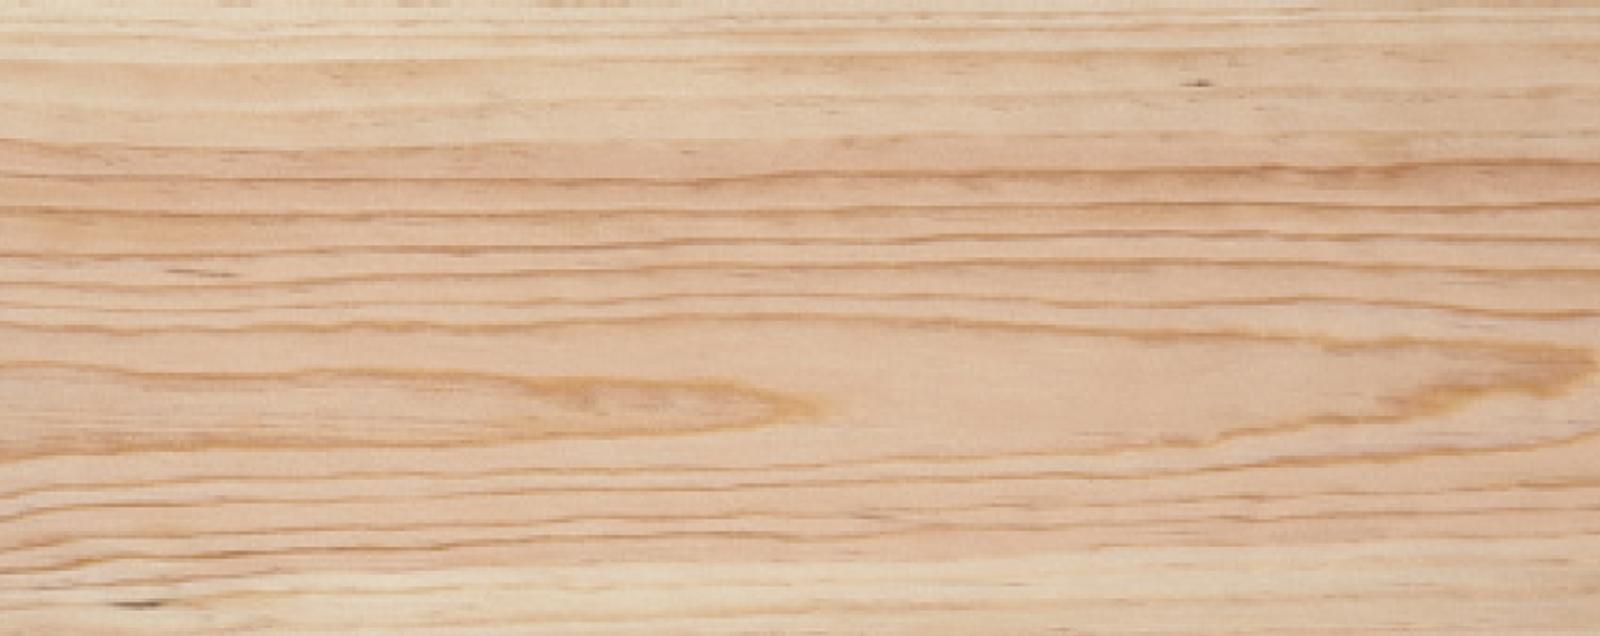 Maderas con feras pino mar timo maderas chapar - Fotos en madera ...